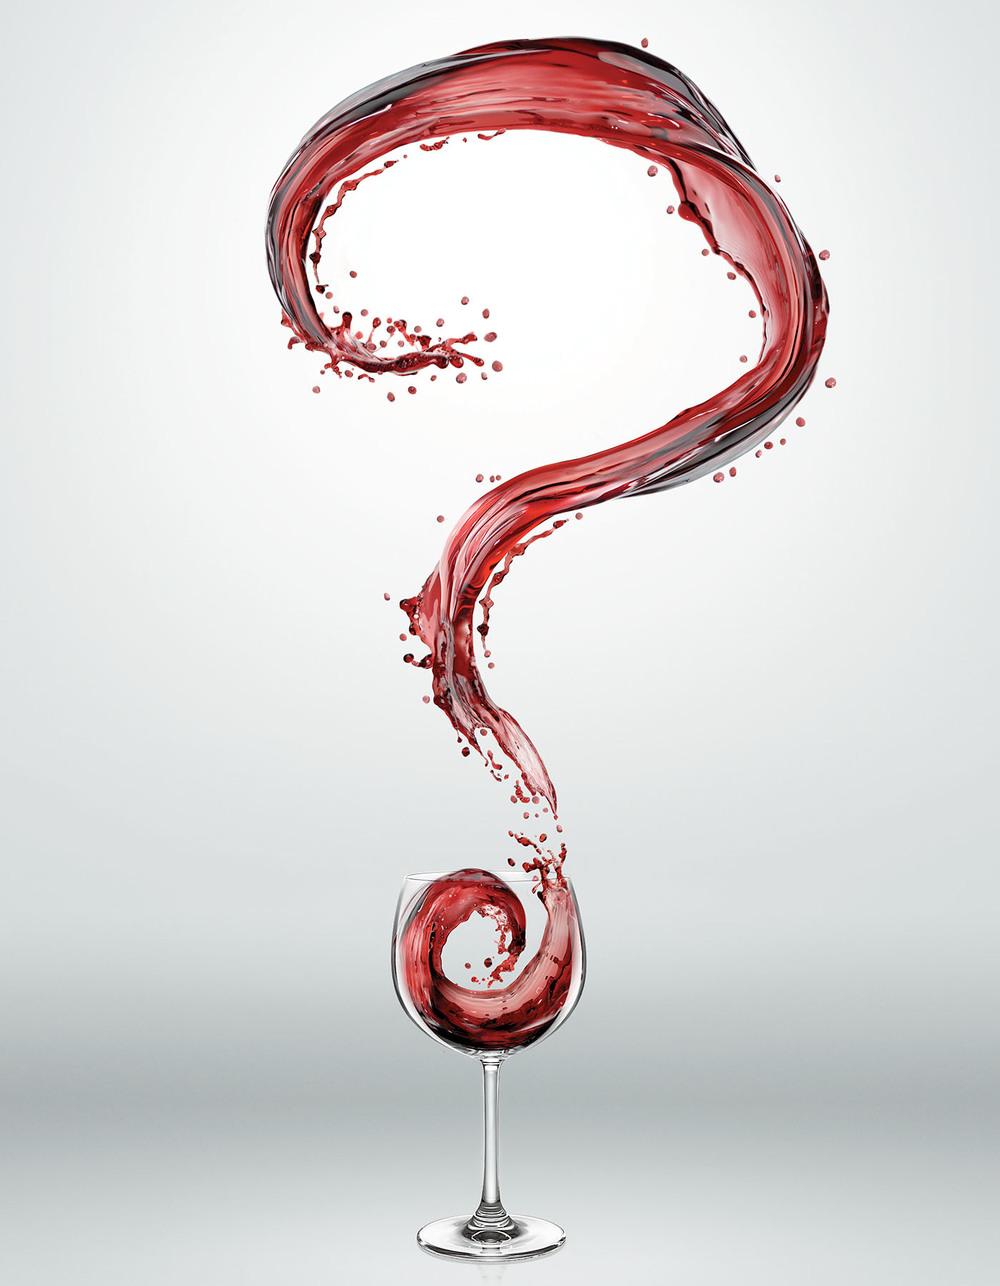 Client: Australian Wine Supply  Tasks: Photography, retouch, grading.